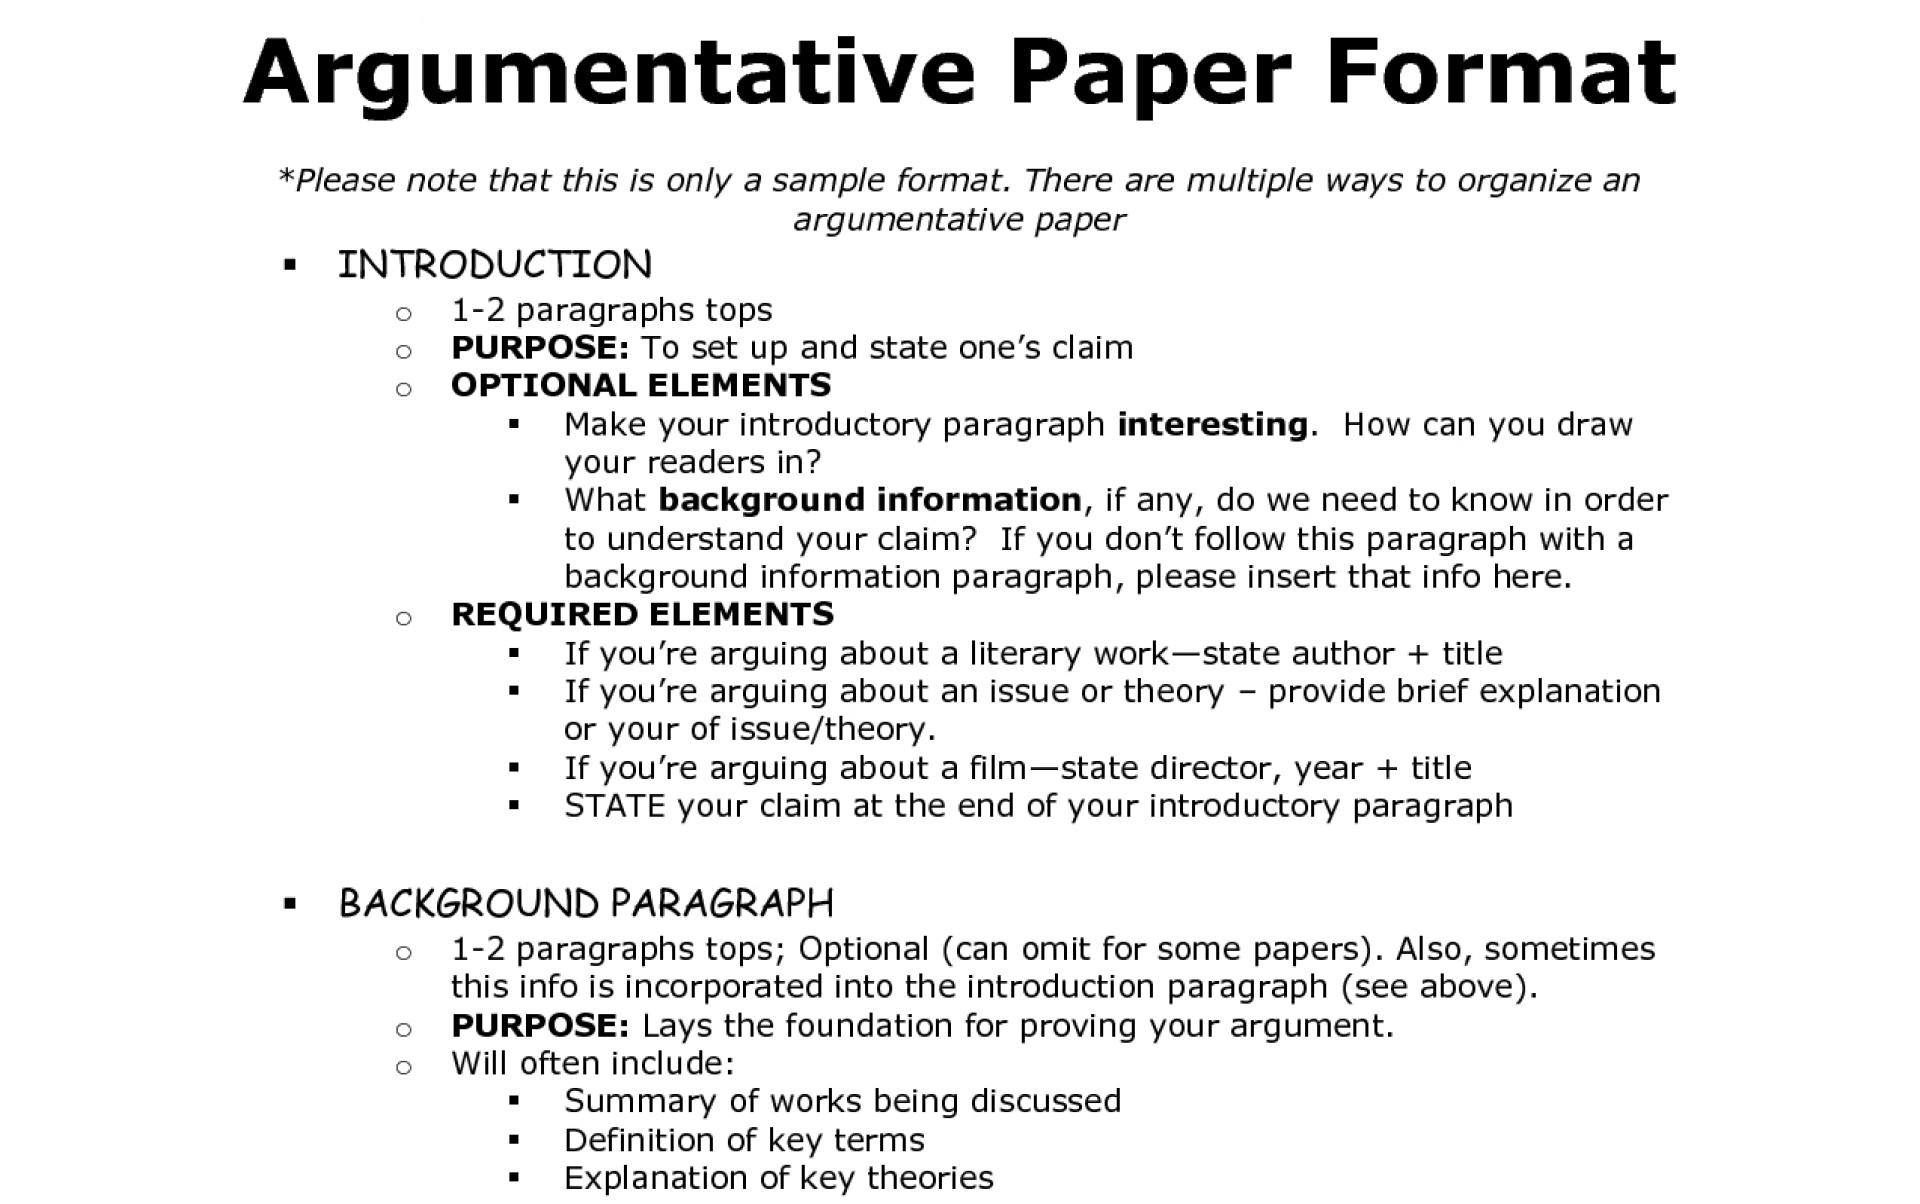 003 Essay Example Structure Of An Argumentative For Body Paragr Rebuttal Igcse Ppt Pdf Outline Ielts Qut Breathtaking (advanced Module) 1920